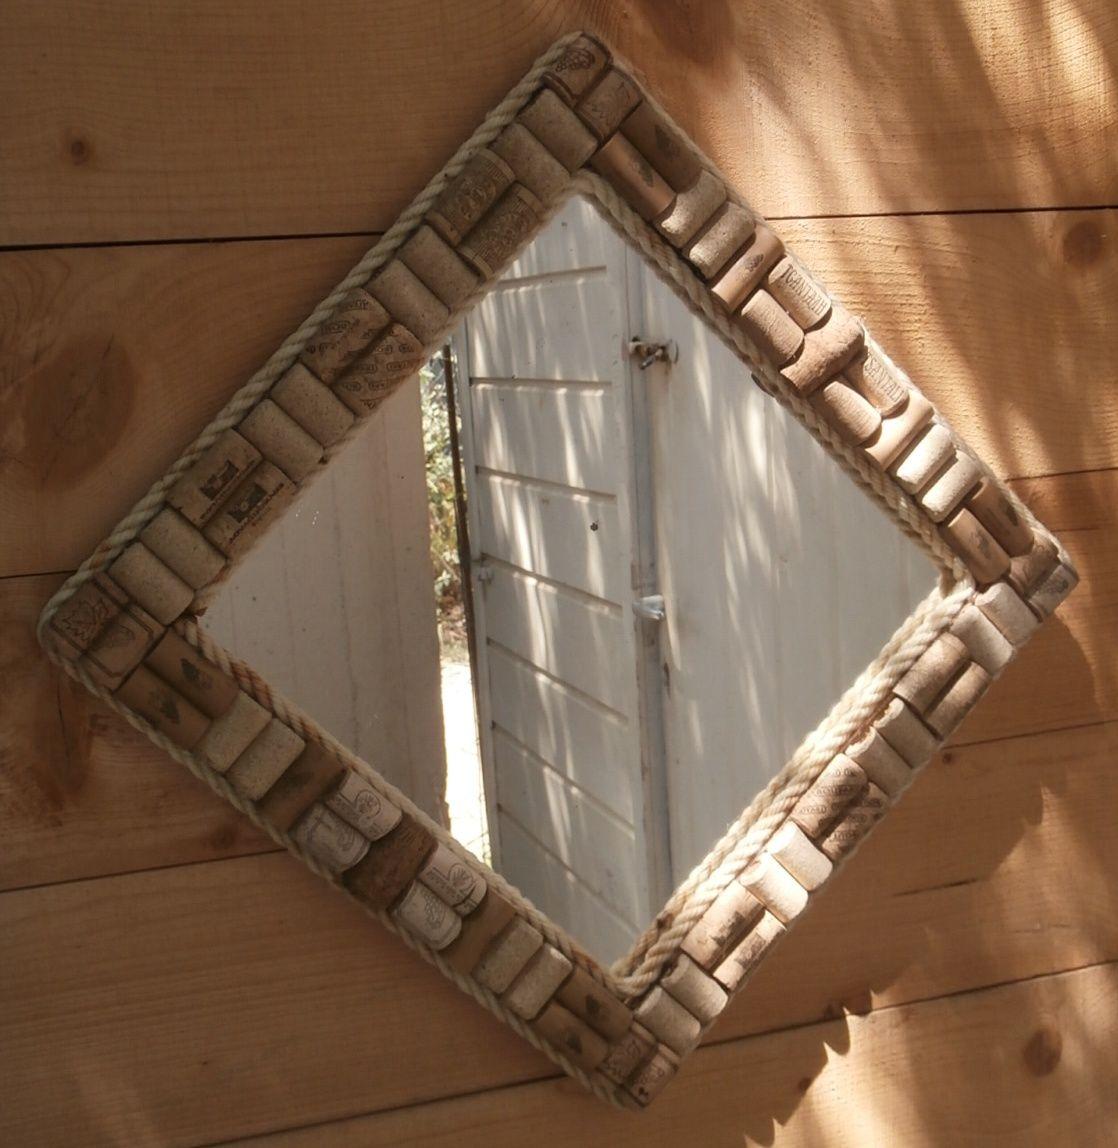 Wine corks framed mirror. | Upcycled Wine Corks | Pinterest ...